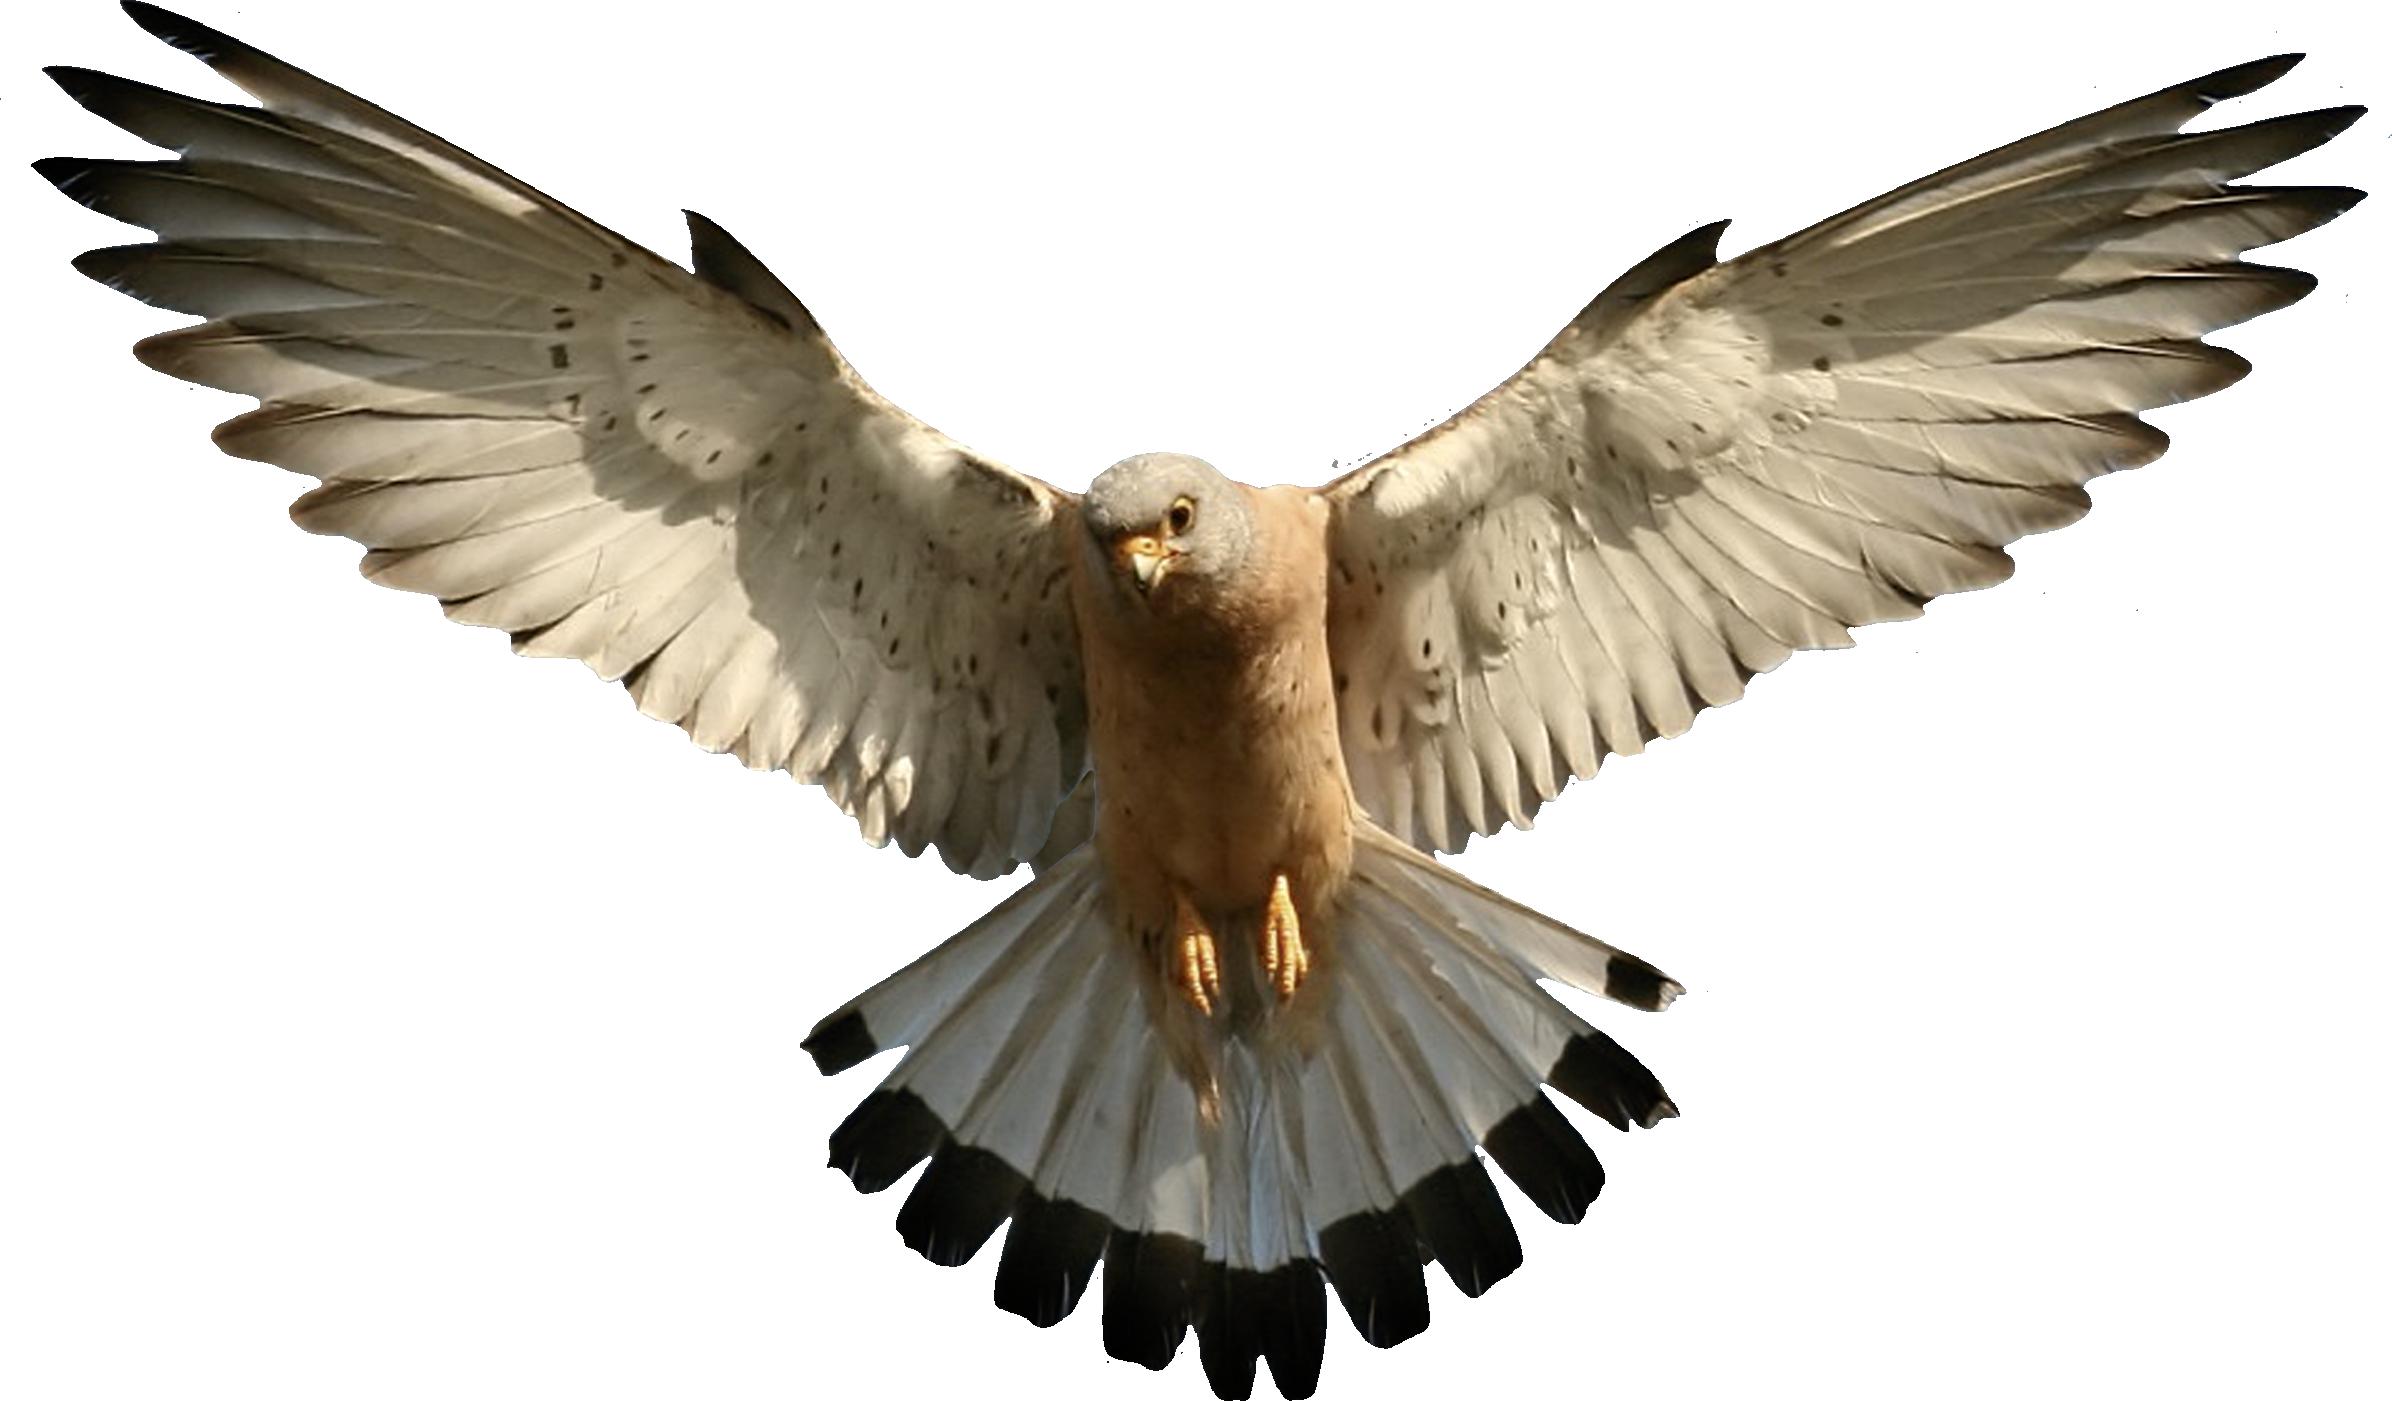 Eagle PNG image, free download